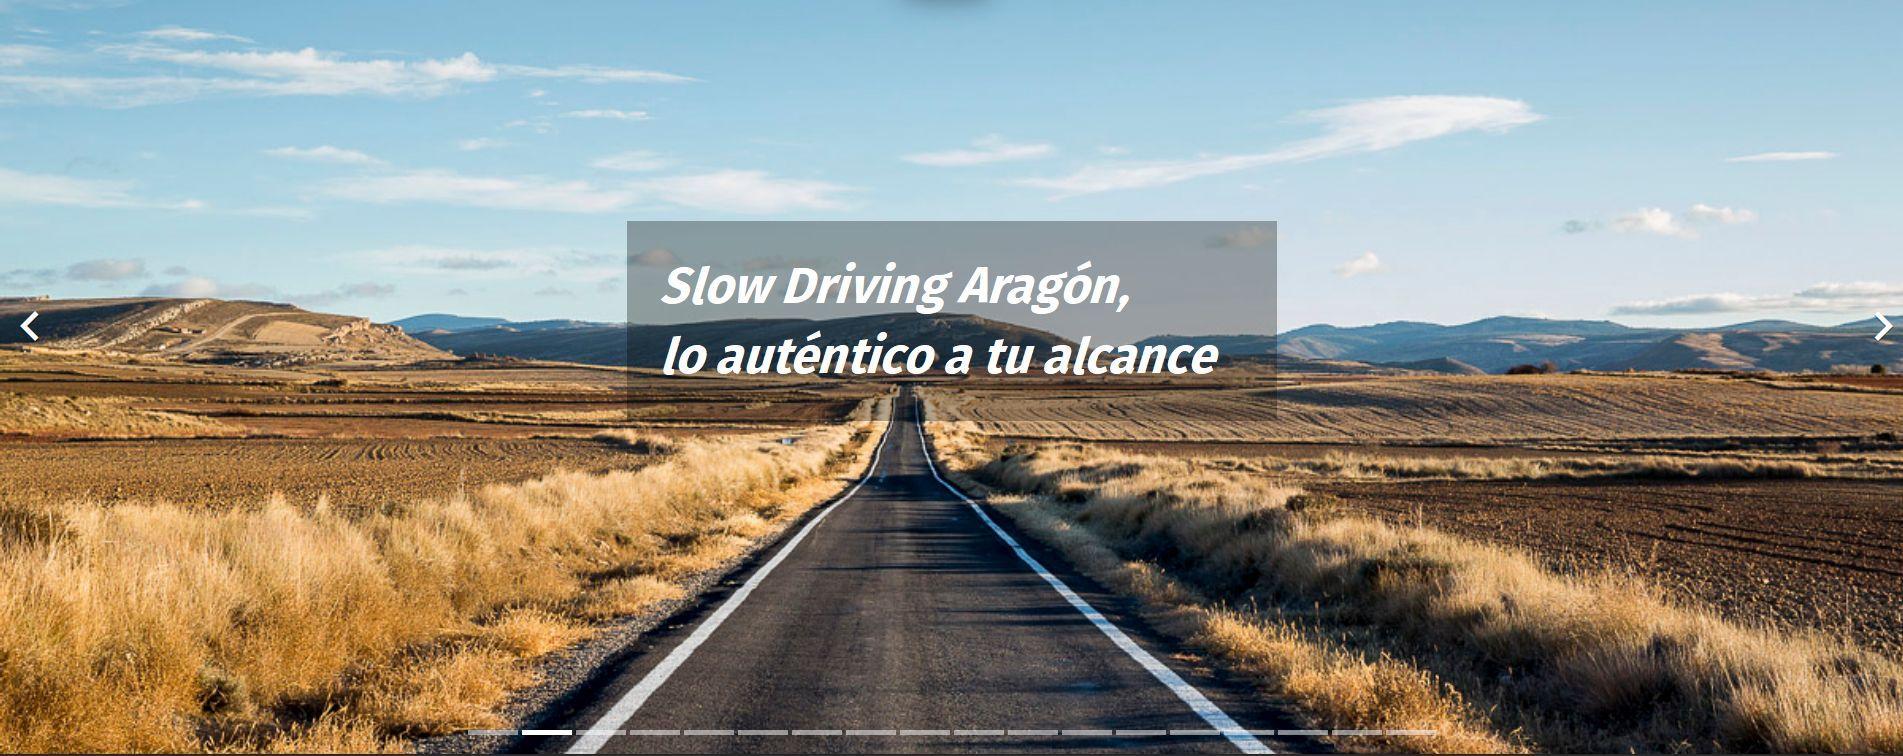 slowdrivingaragon.jpg